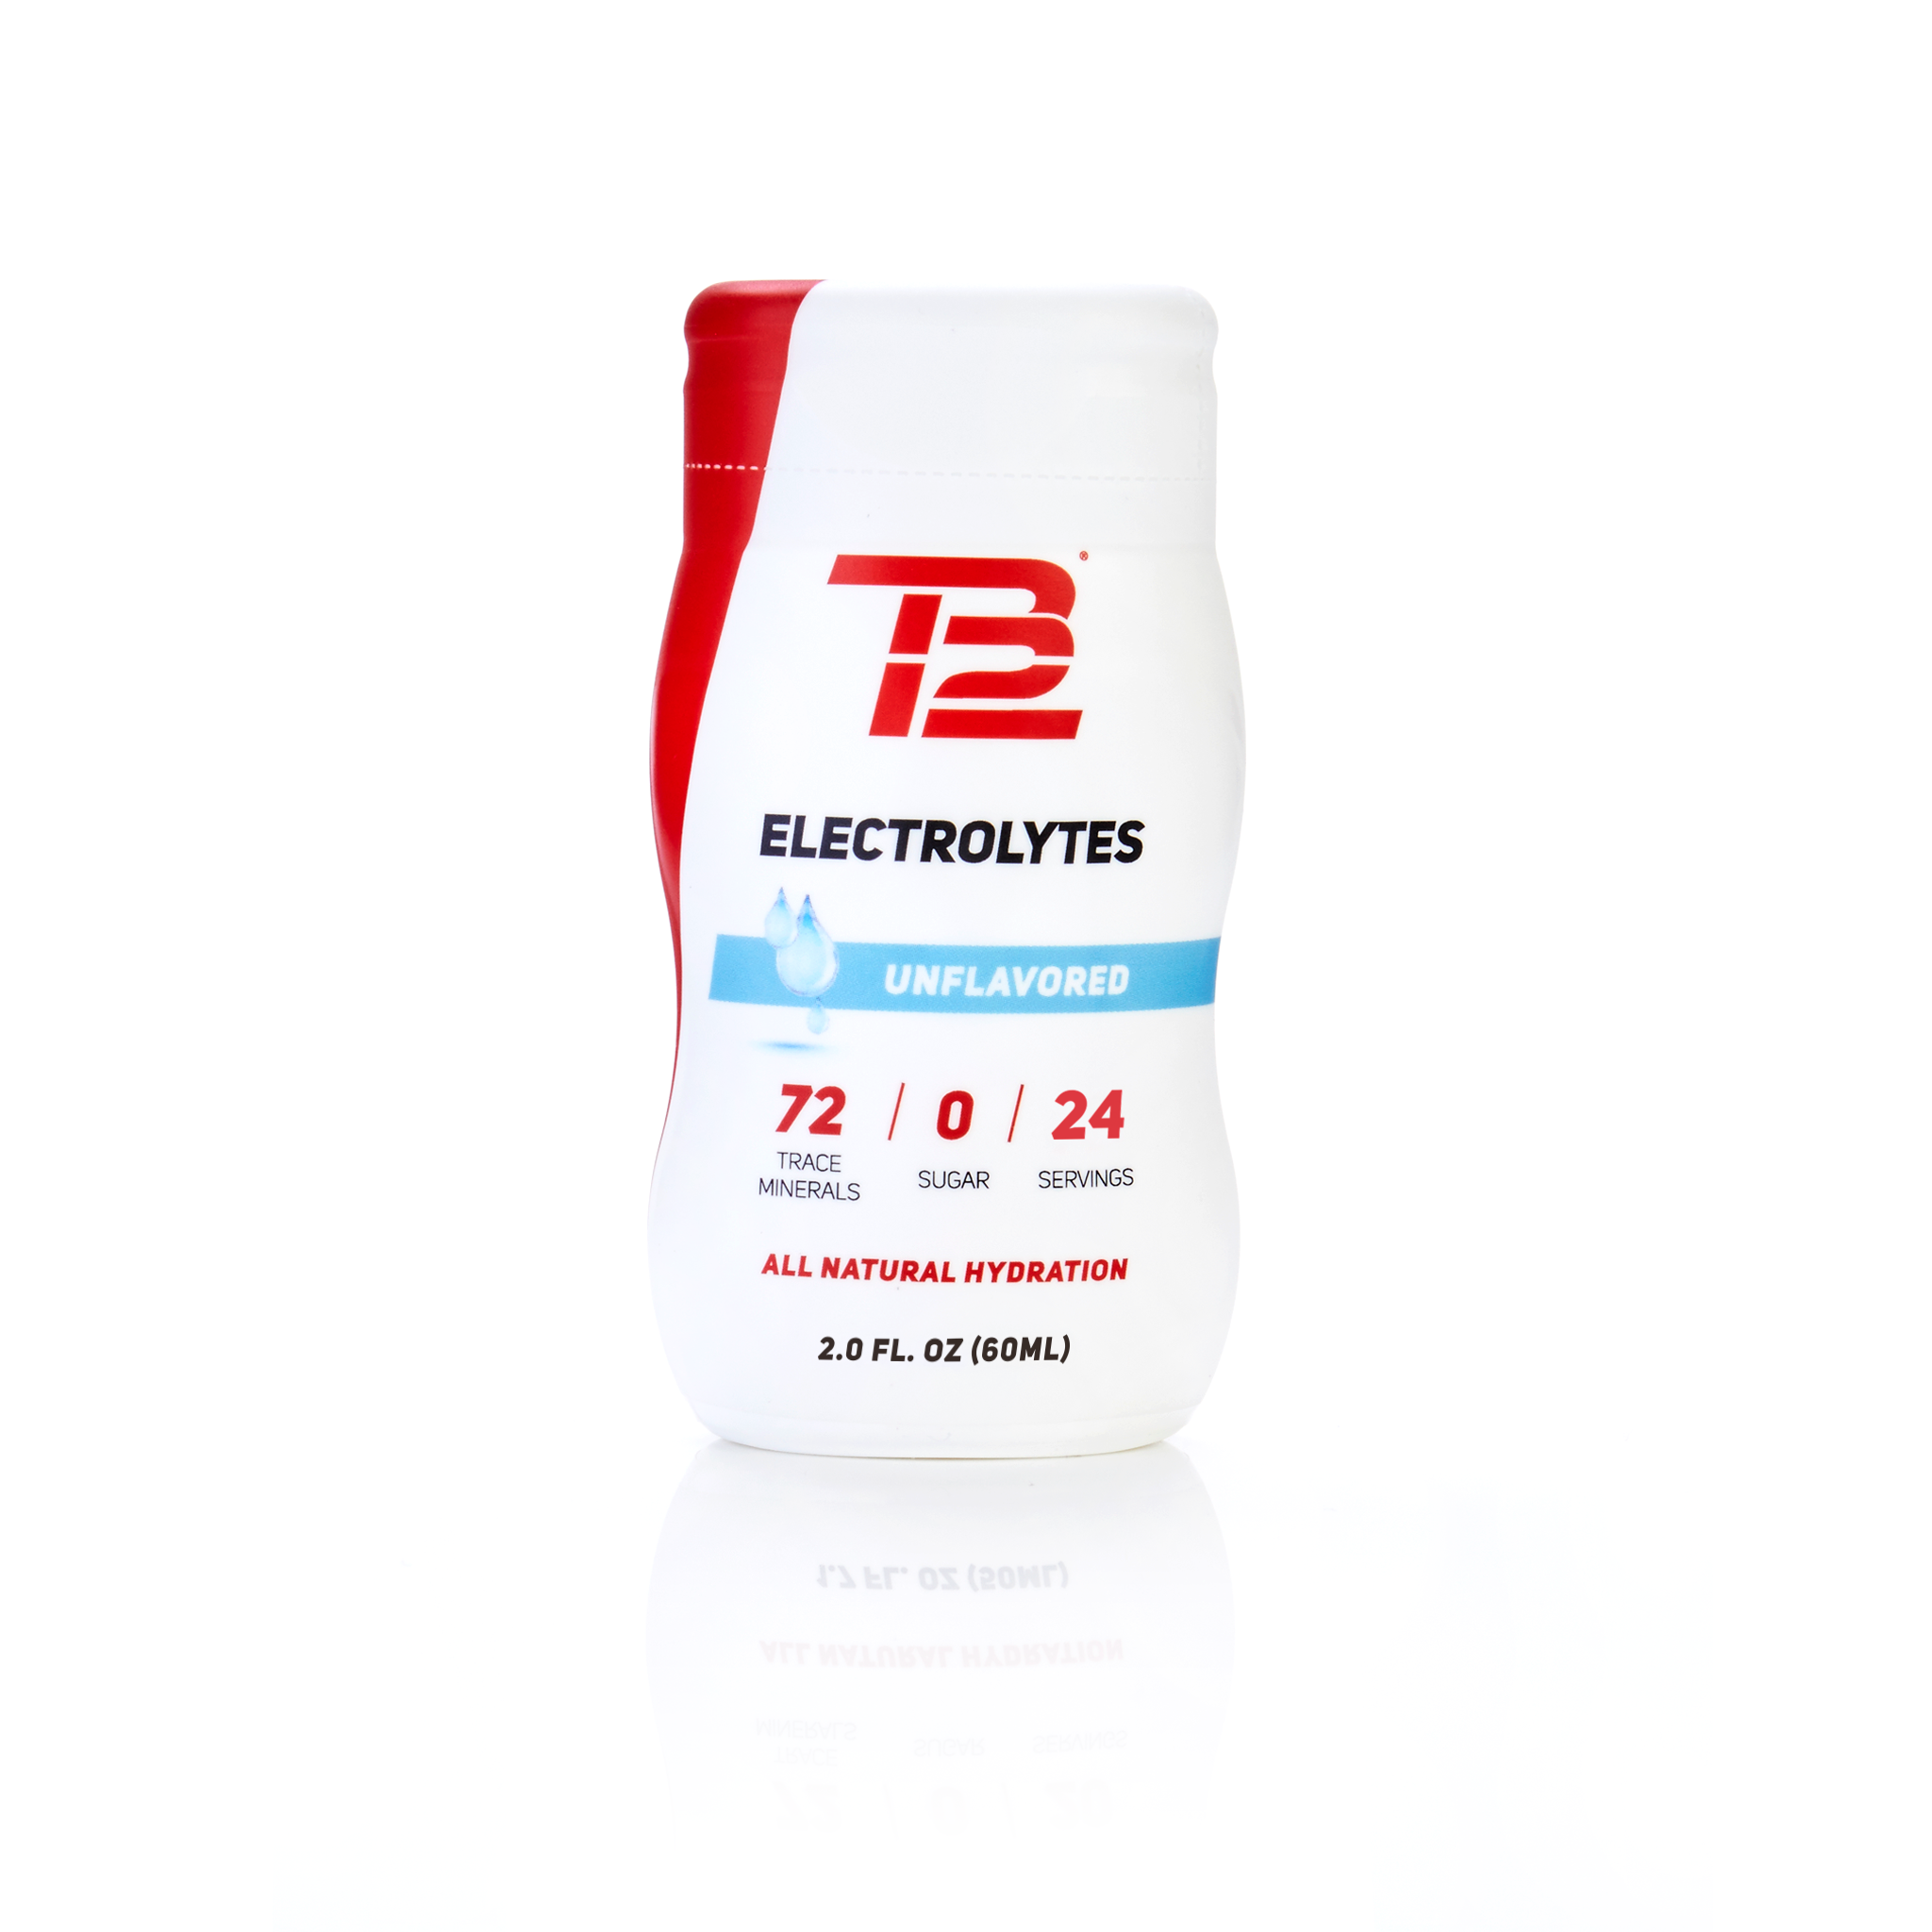 TB12 Electrolytes